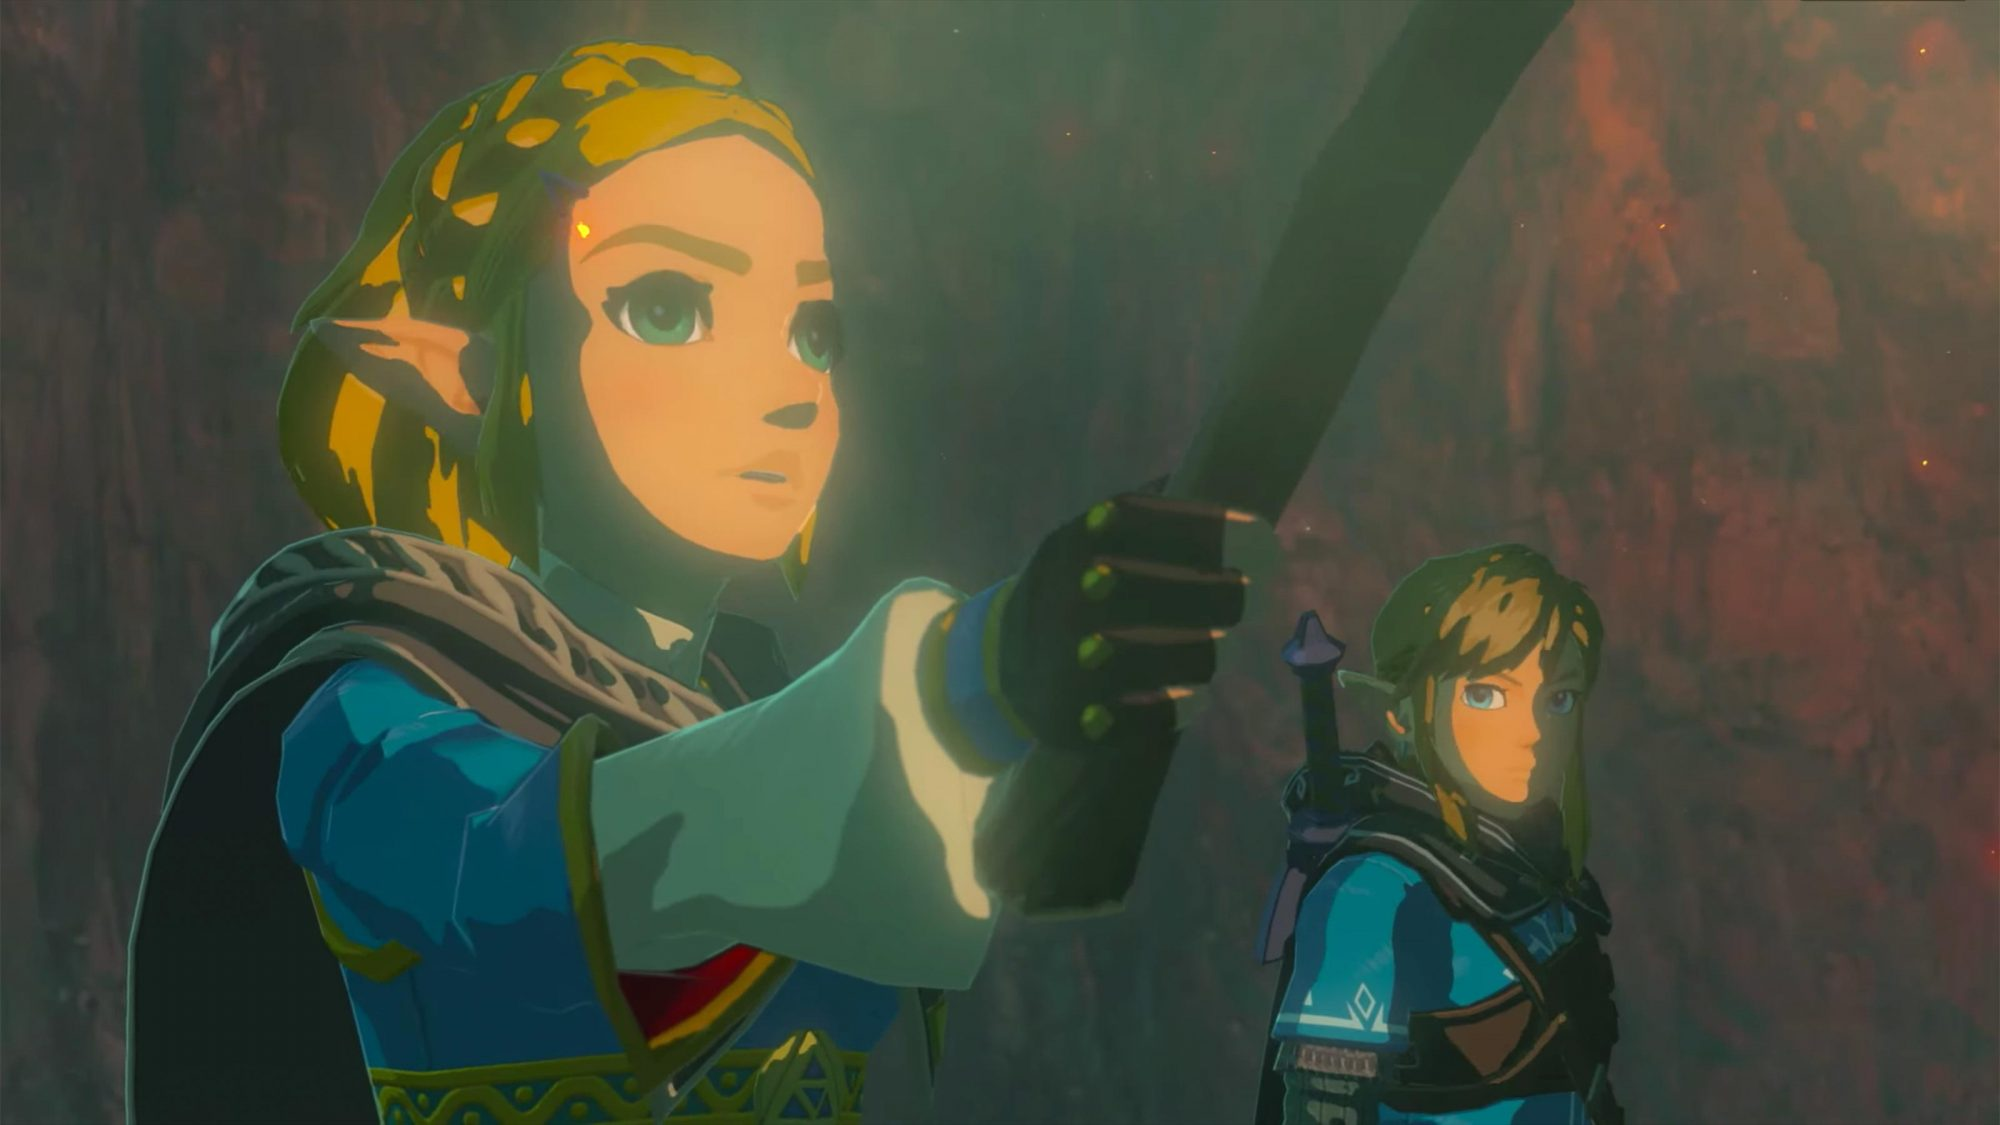 Sequel to The Legend of Zelda: Breath of the Wild - First Look Trailer (screen grab) https://www.youtube.com/watch?v=3fr1Z07AV00 CR: Nintendo